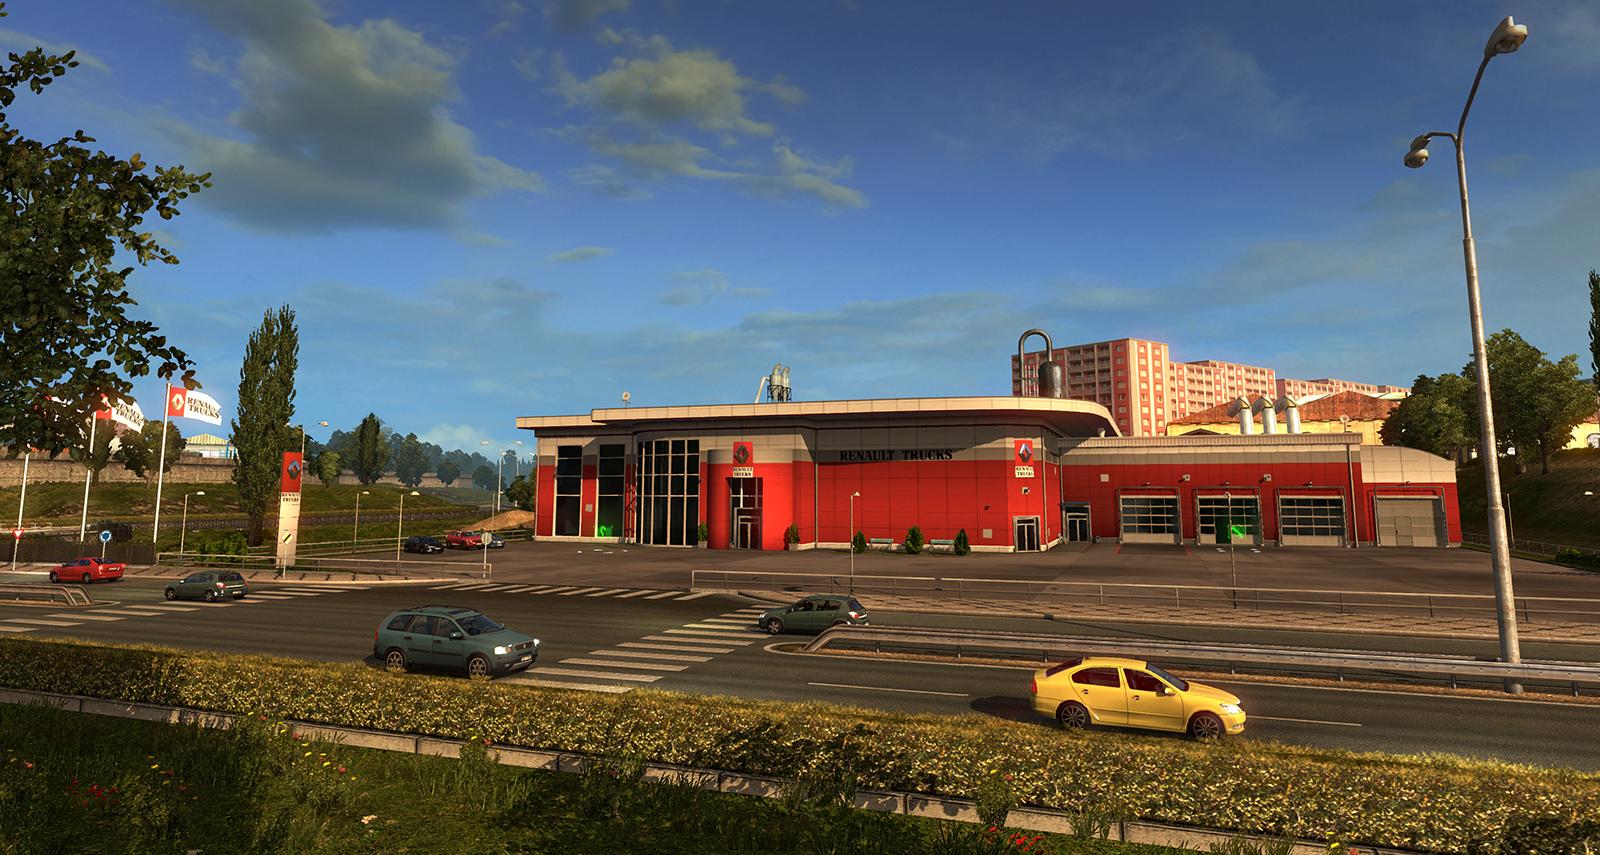 Euro truck simulator 2 mods daf xf 105 james s hislop pictures to pin -  Euro Truck Simulator 2 Http 1 Bp Blogspot Com F94wbh70rya Vl Big_renault Jpg